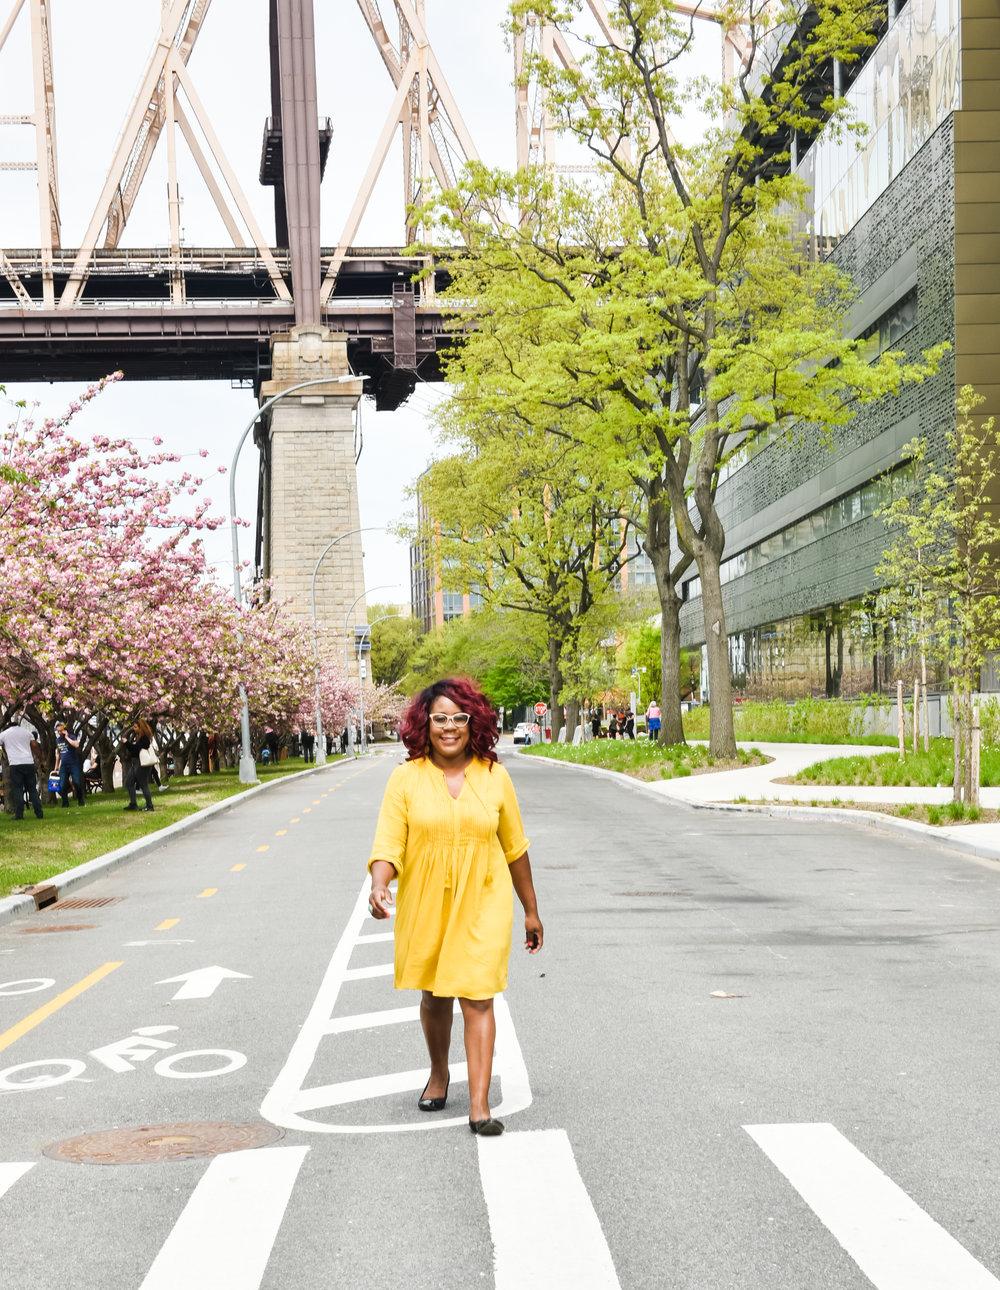 NYC, Street shots, donna shoots